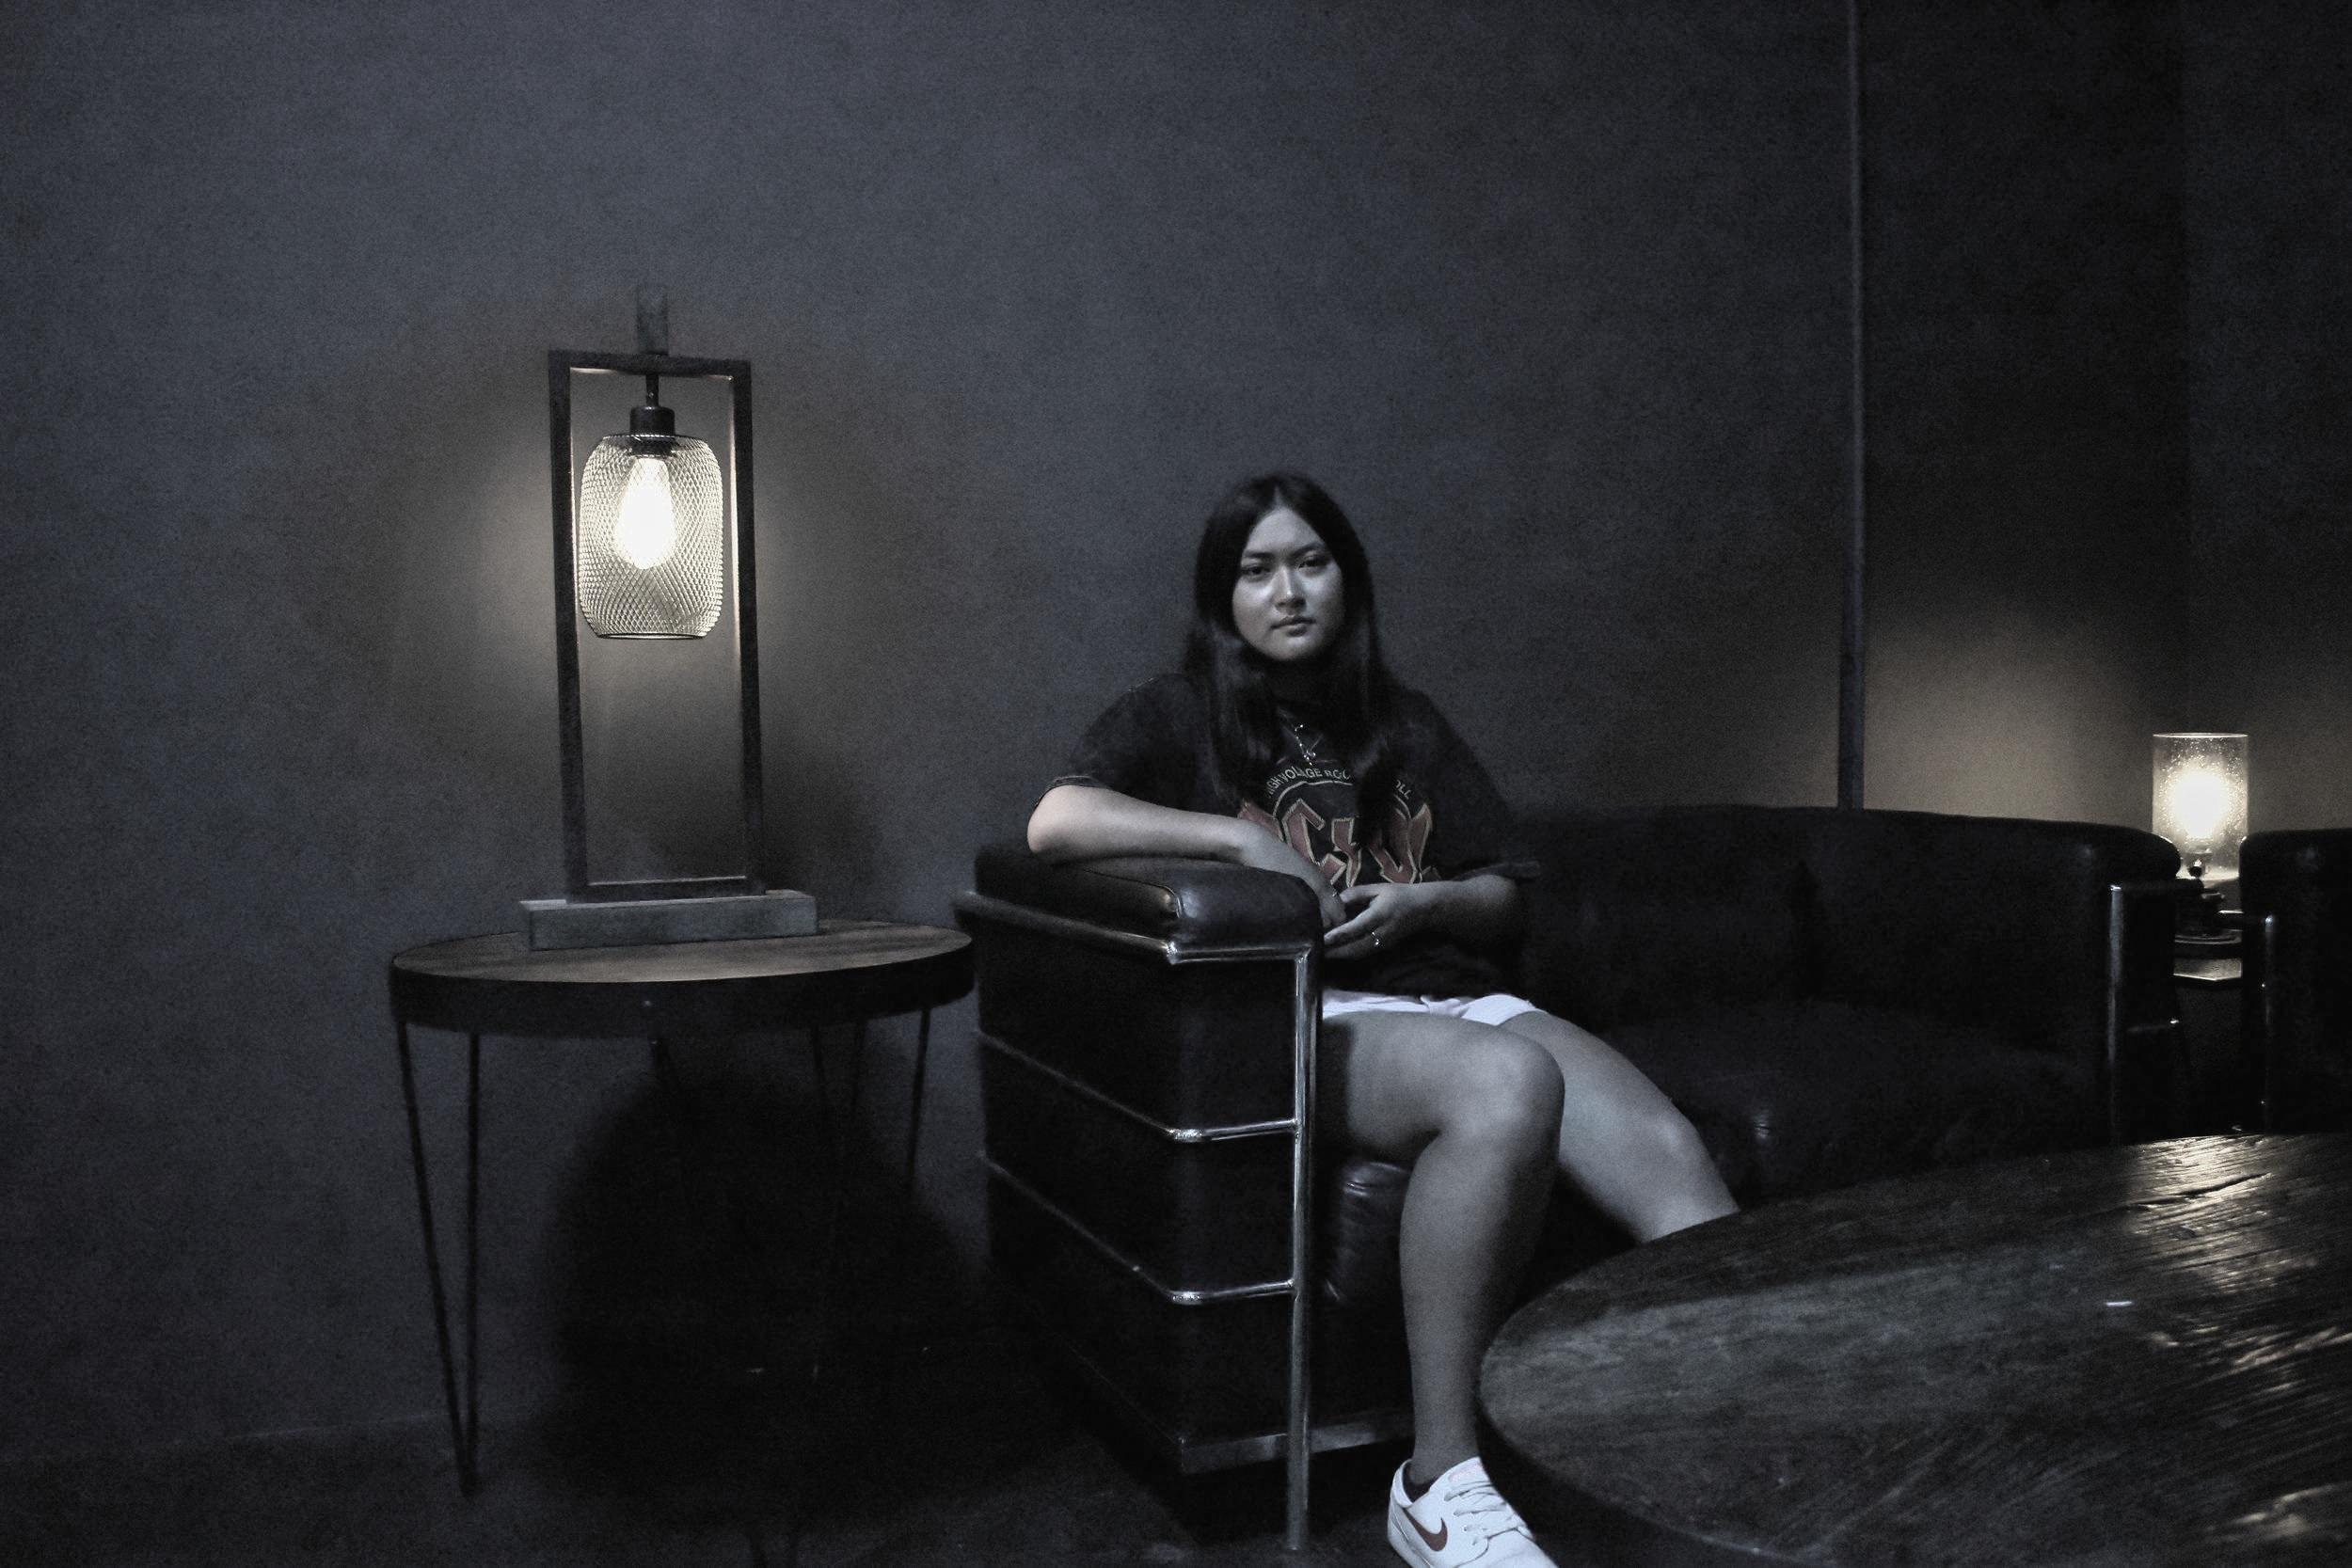 GIANNA - SOCIAL MEDIA: @ITSGIANNAK